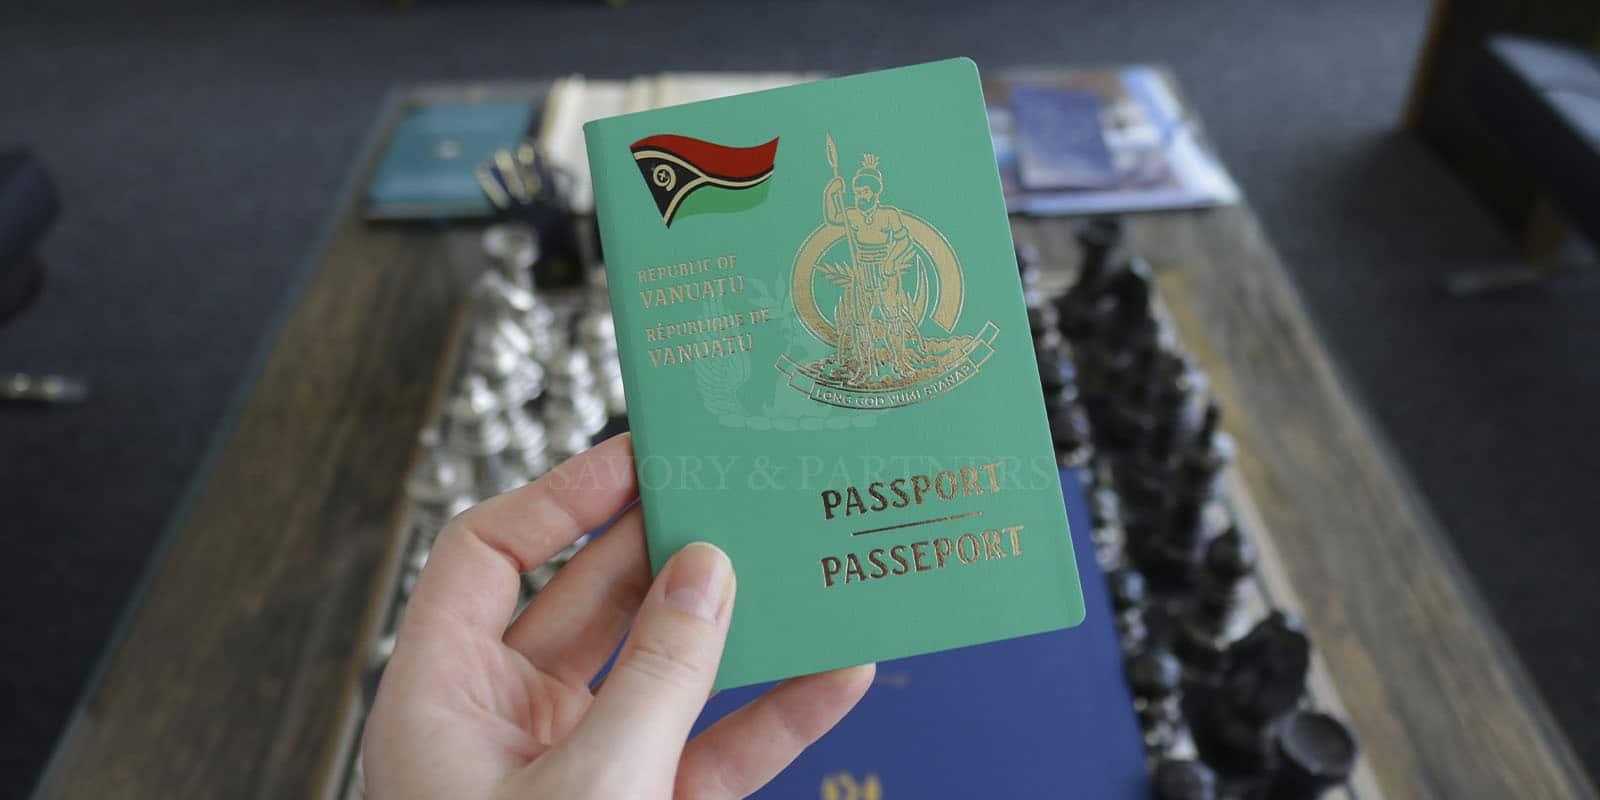 Vanuatu passport at Savory & Partners offices in Dubai.